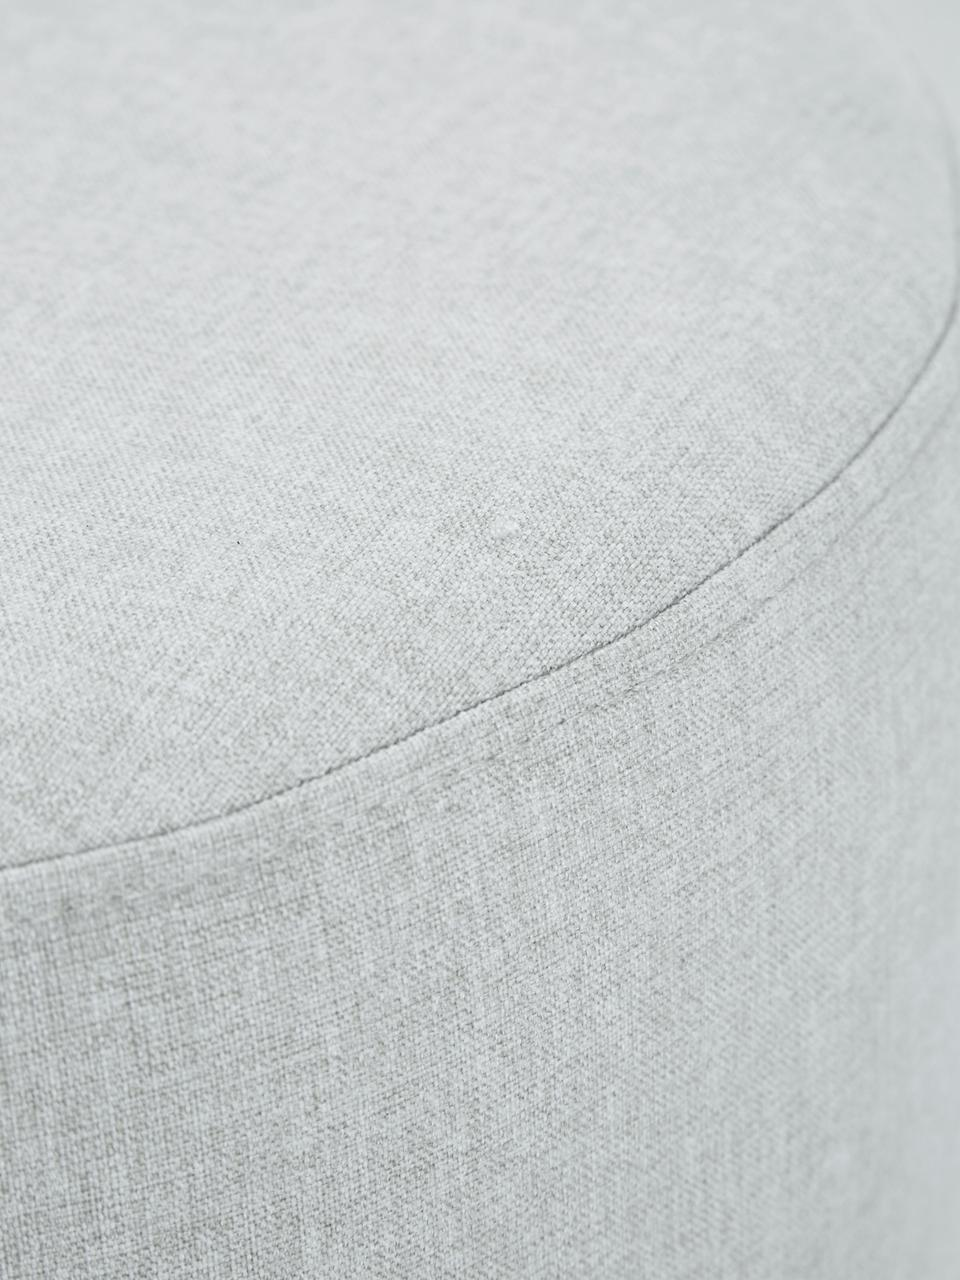 Hocker Mara mit Wiener Geflecht, Bezug: Polyester Der hochwertige, Rahmen: Sperrholz, Fuß: Massives Birkenholz, Ratt, Grau, Ø 37 x H 39 cm